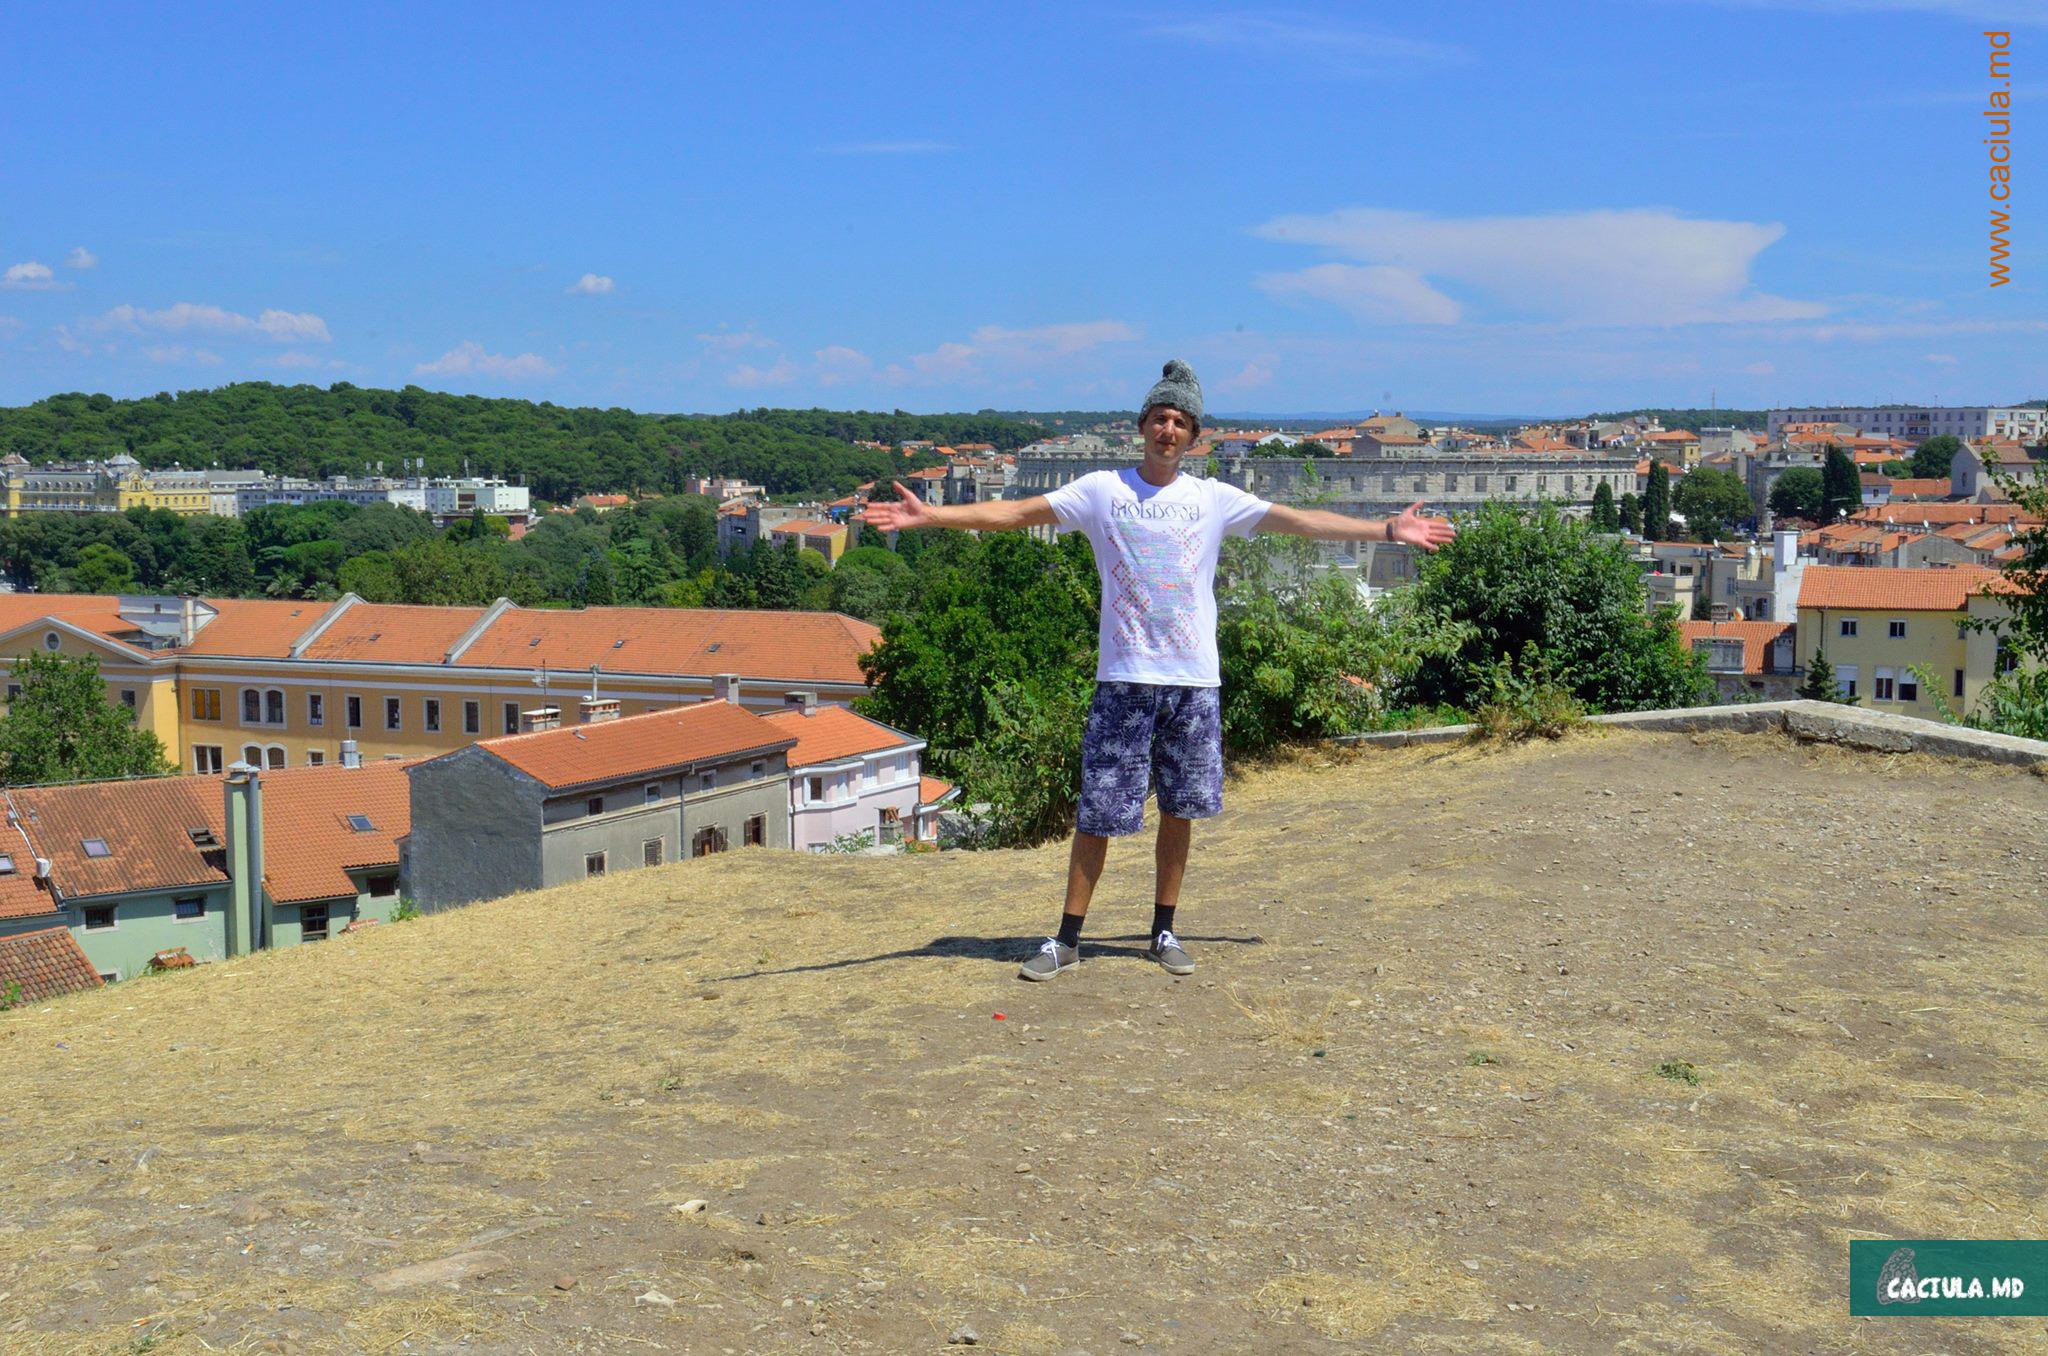 пейзажи Хорватии и Черногории